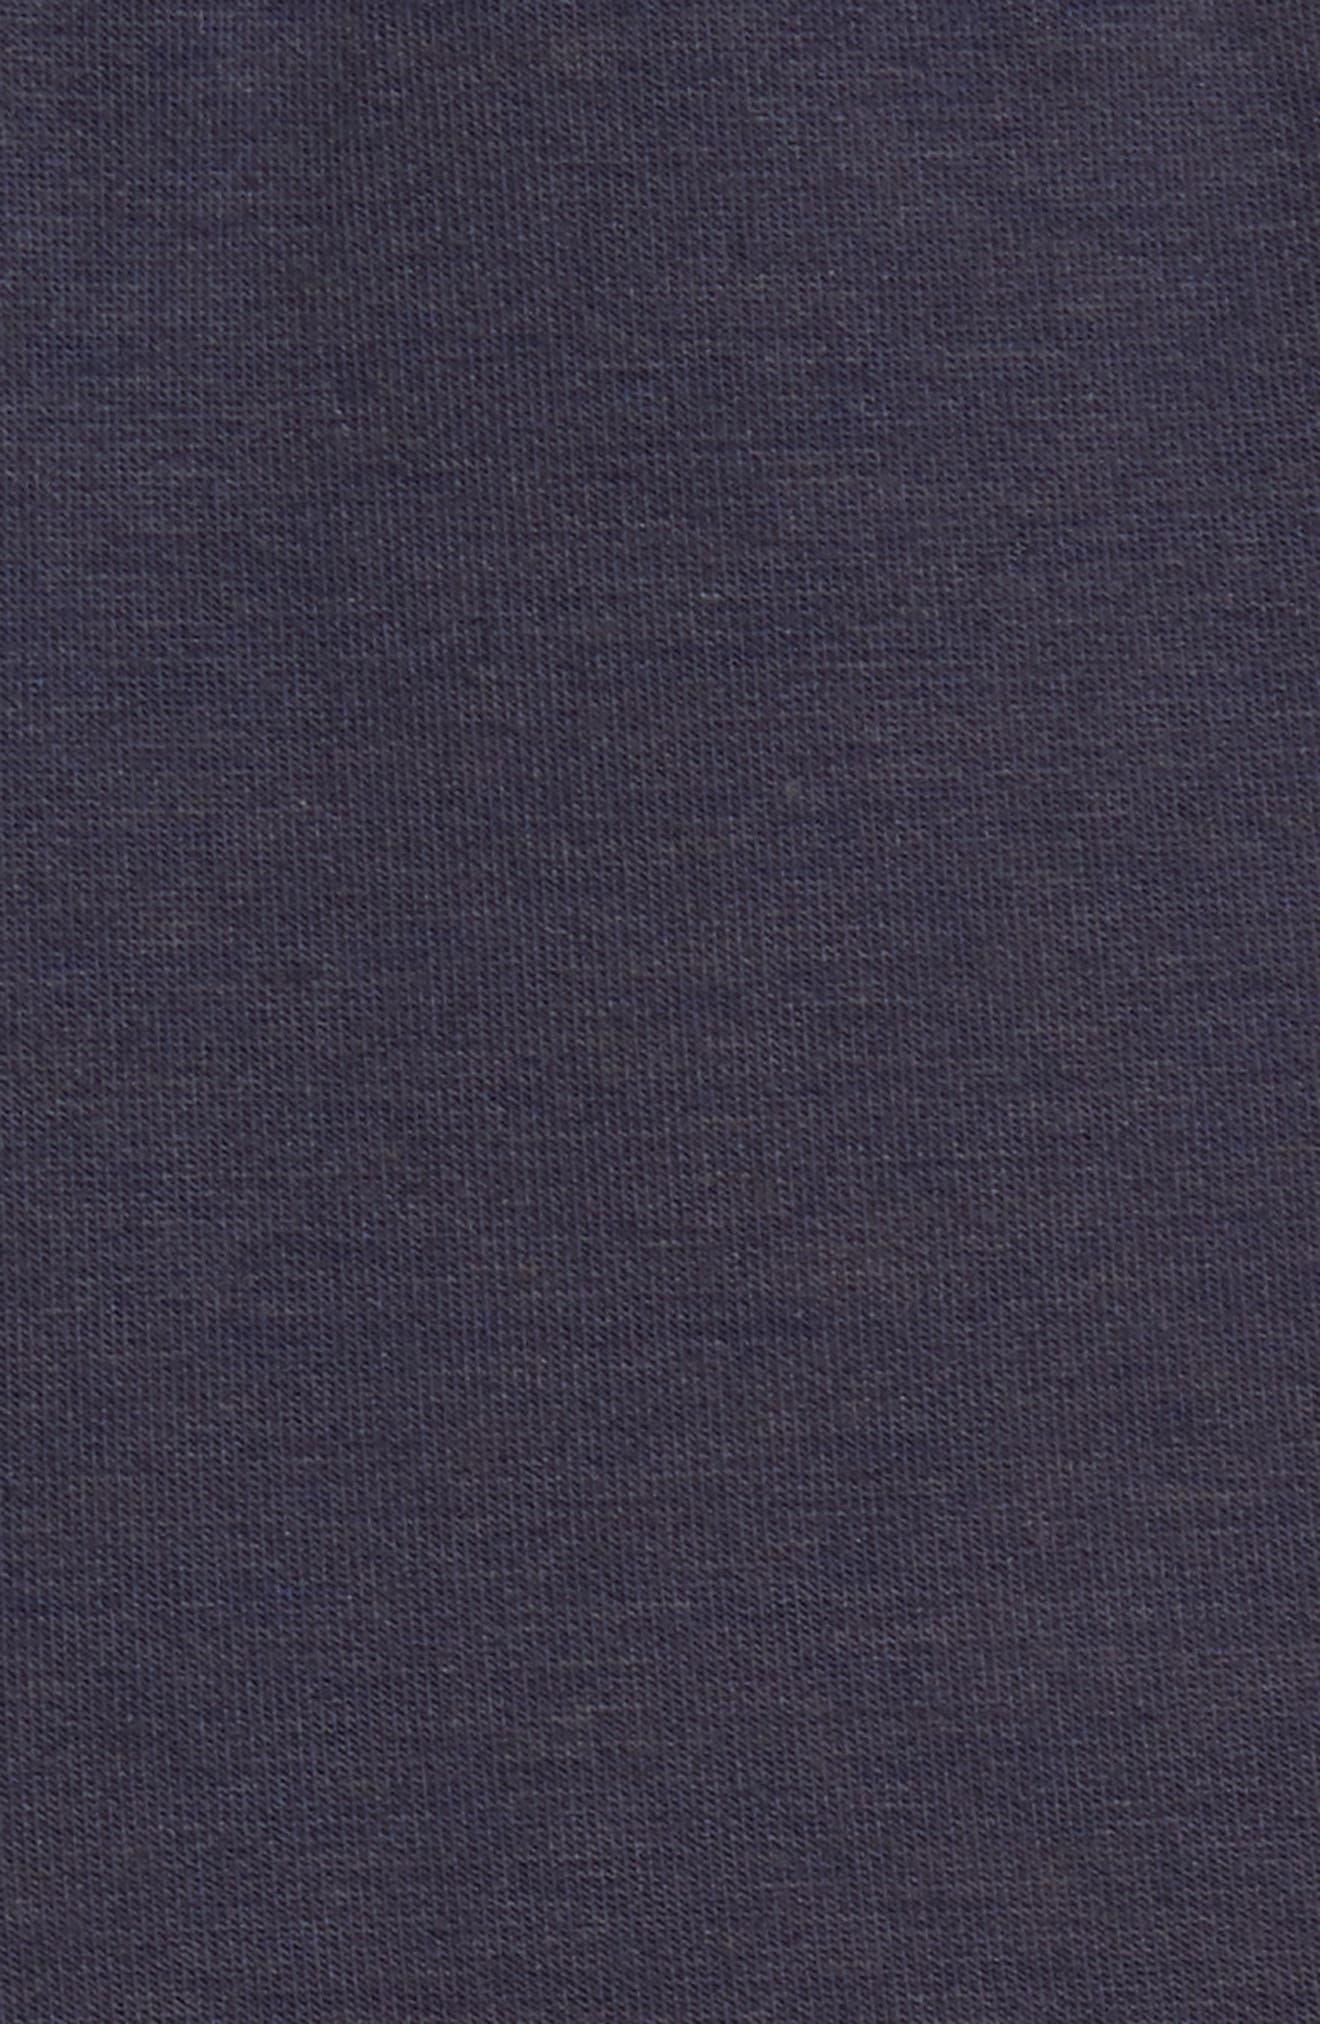 Alternate Image 5  - Zella Tech Interlock Knit Pant